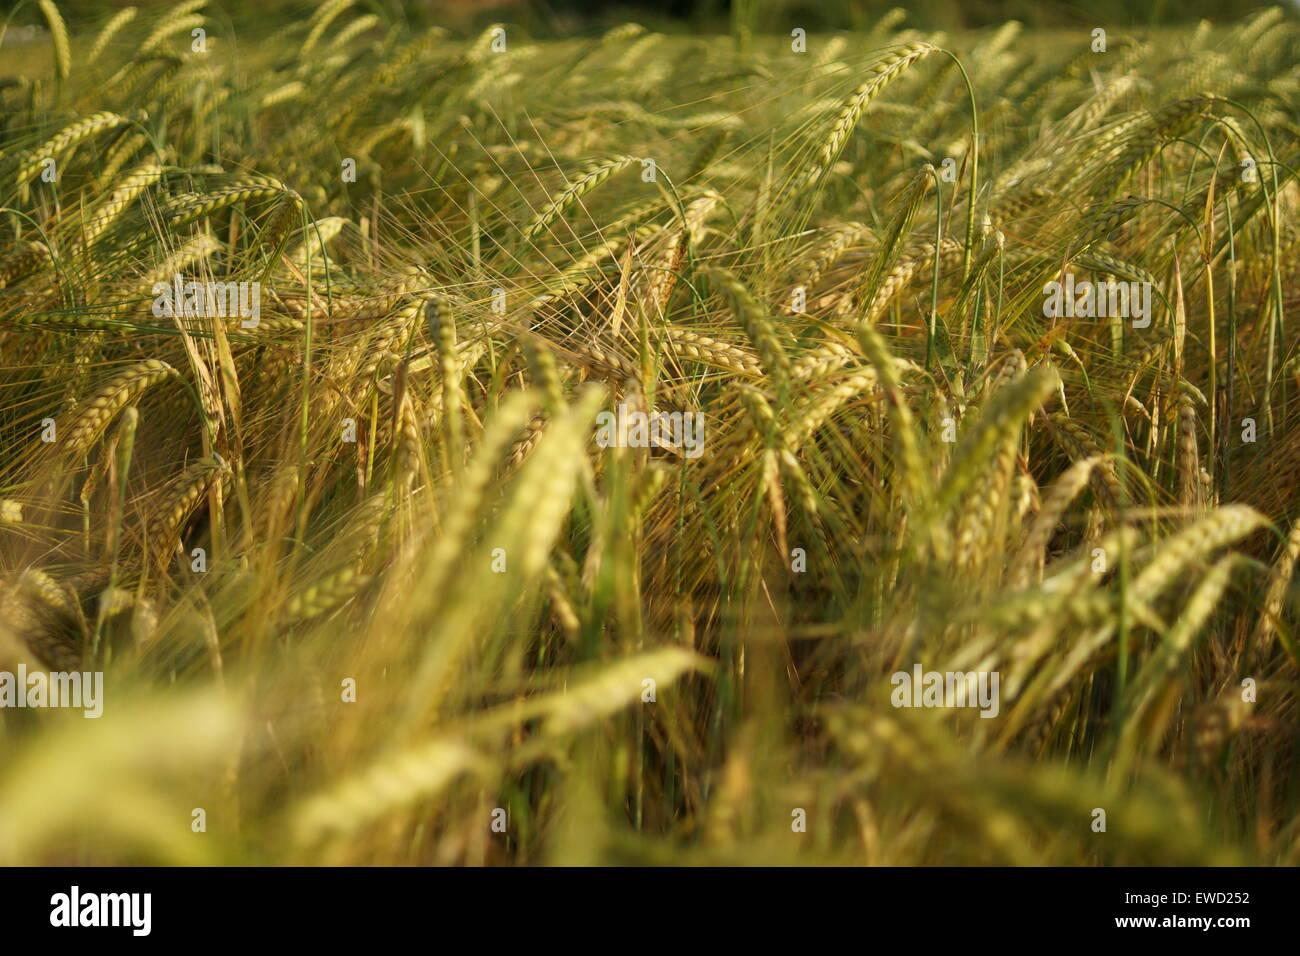 Closeup of a grain field - Stock Image